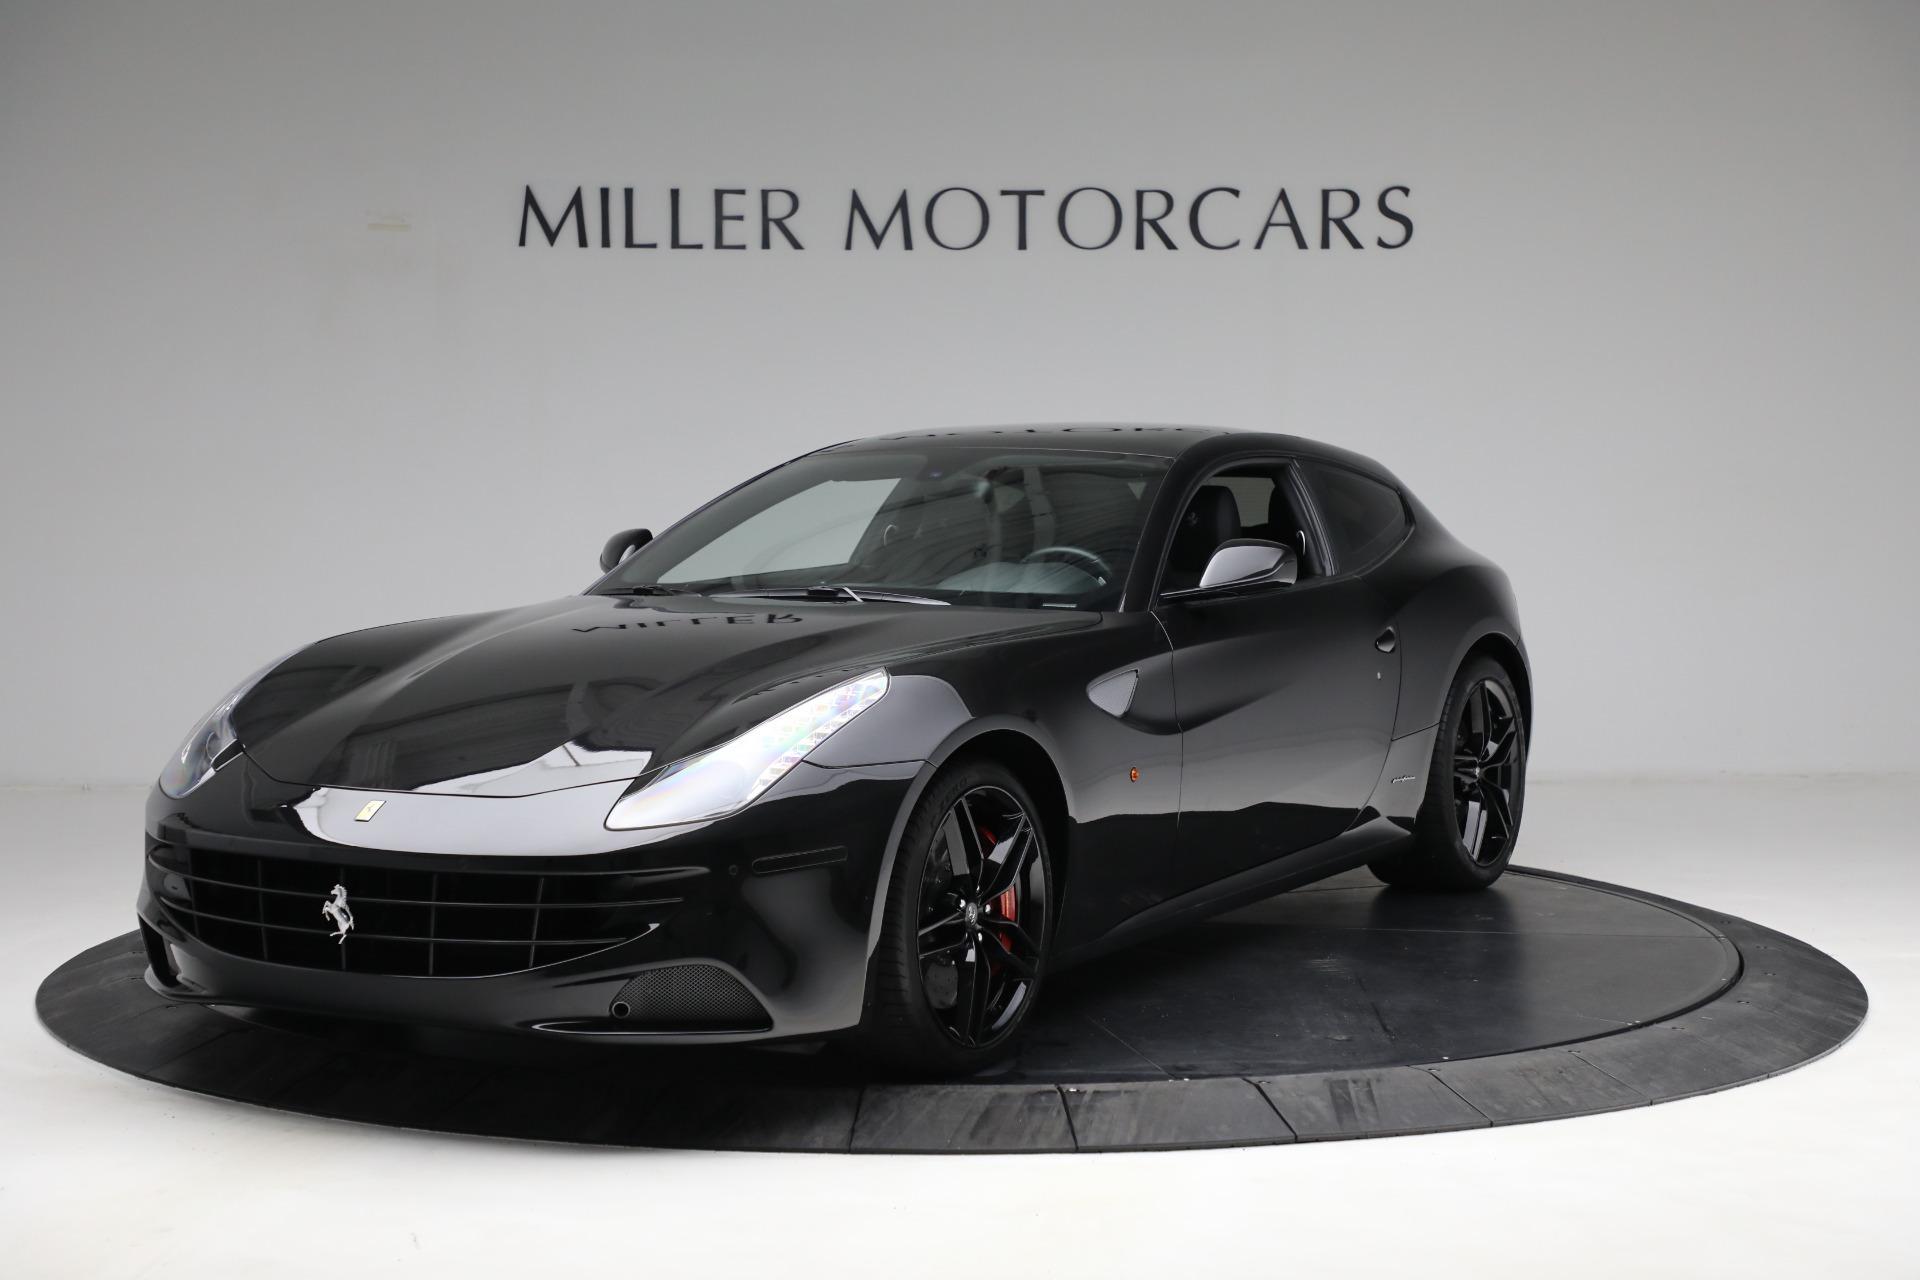 Used 2014 Ferrari FF for sale $144,900 at Maserati of Greenwich in Greenwich CT 06830 1